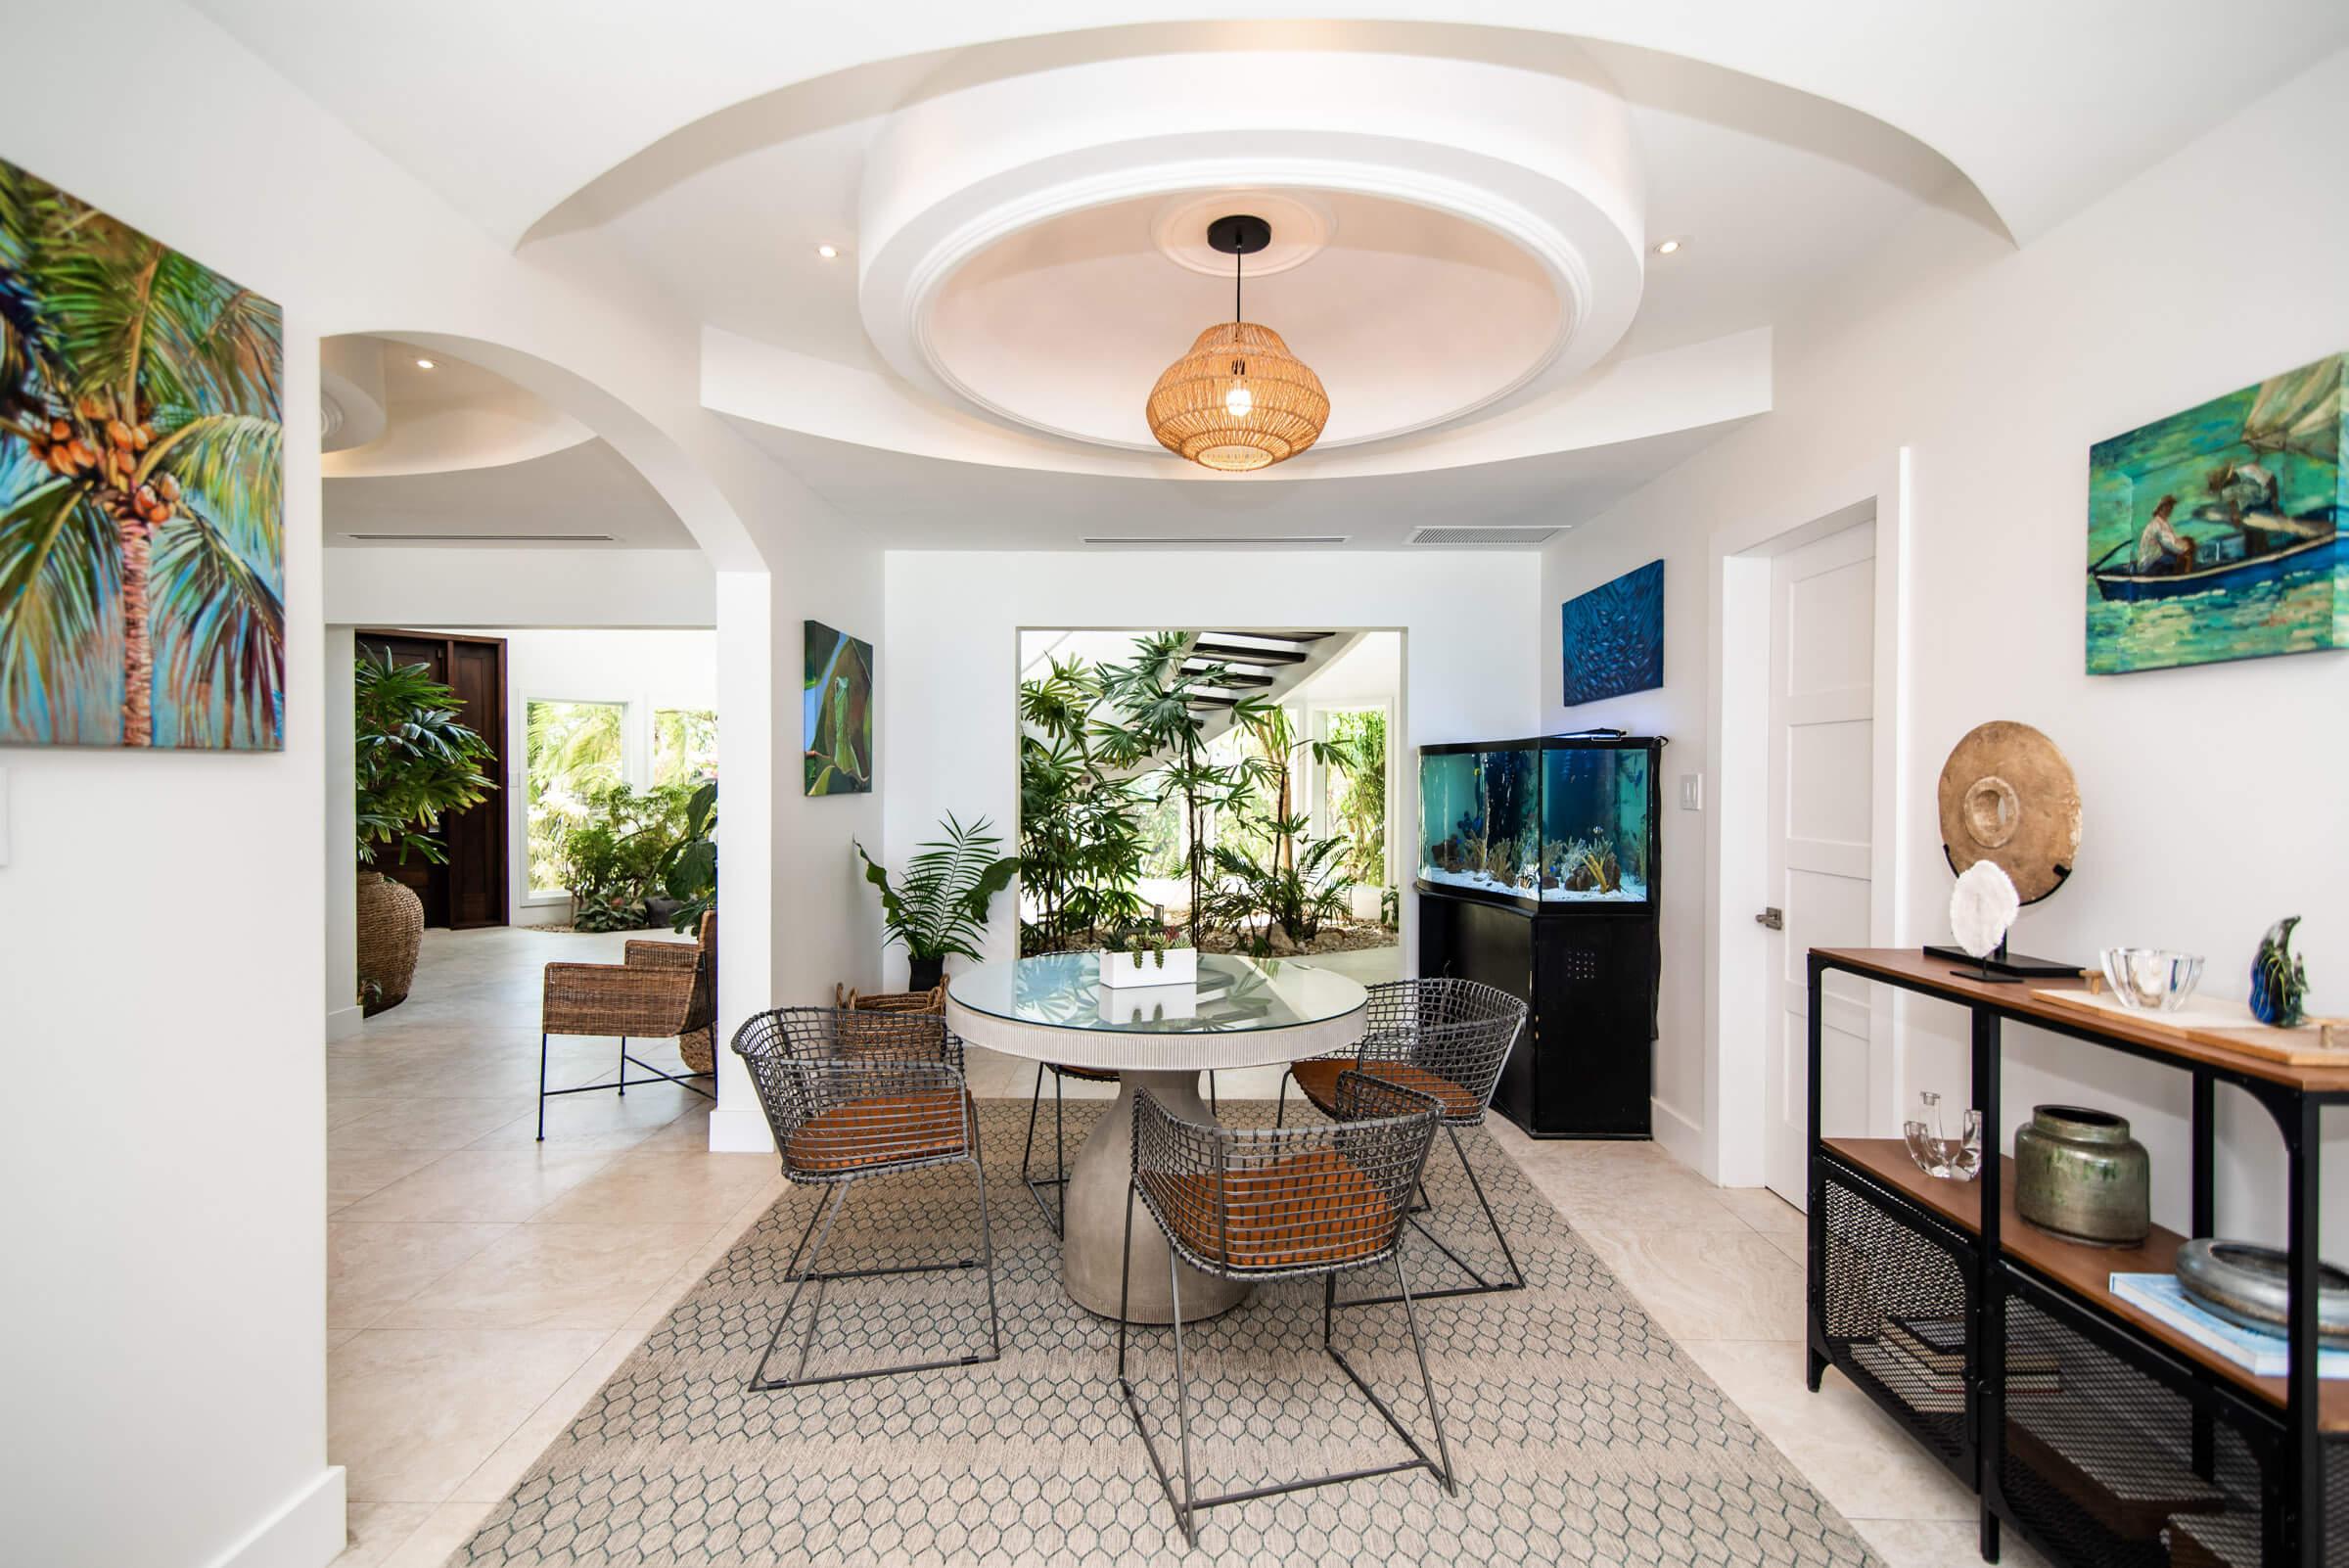 Seascape Villa Cayman Islands Grand Cayman Family Beachfront Luxury Caribbean Vacation Rental Dining Room Family Room Entertainment Area